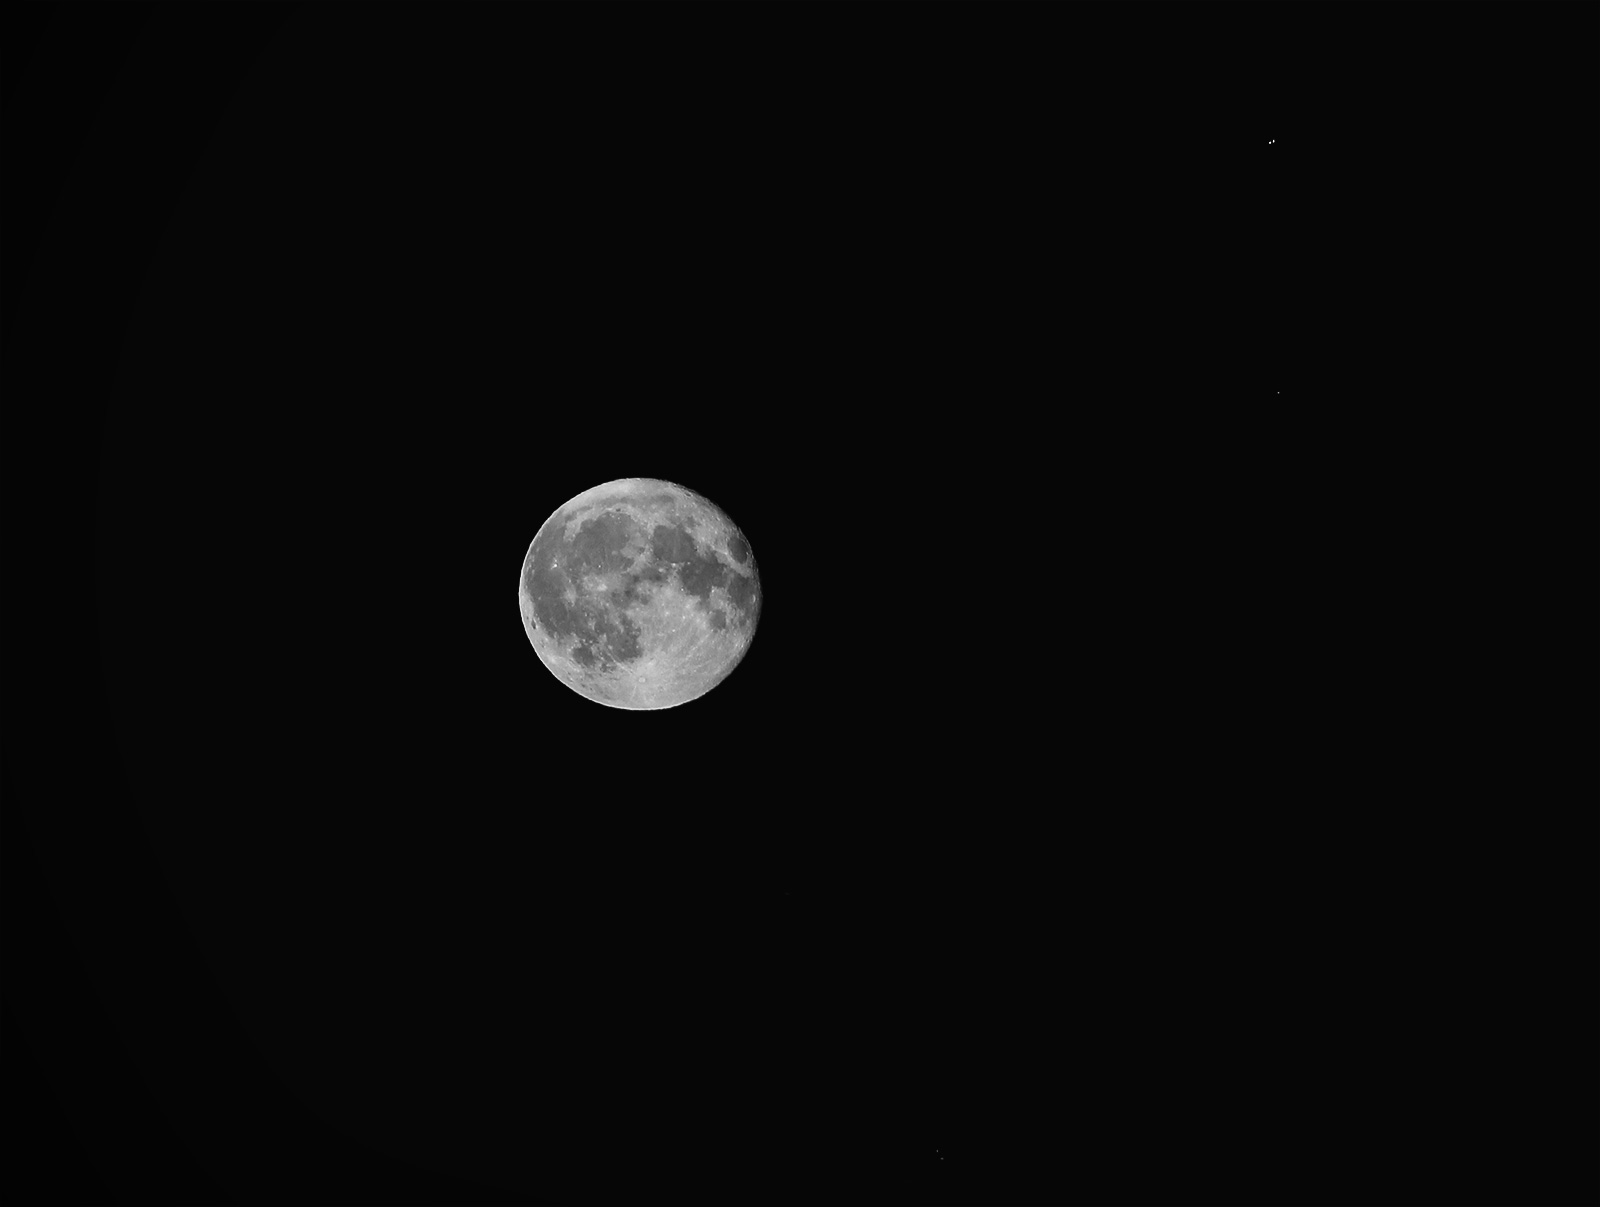 bw-moon-02